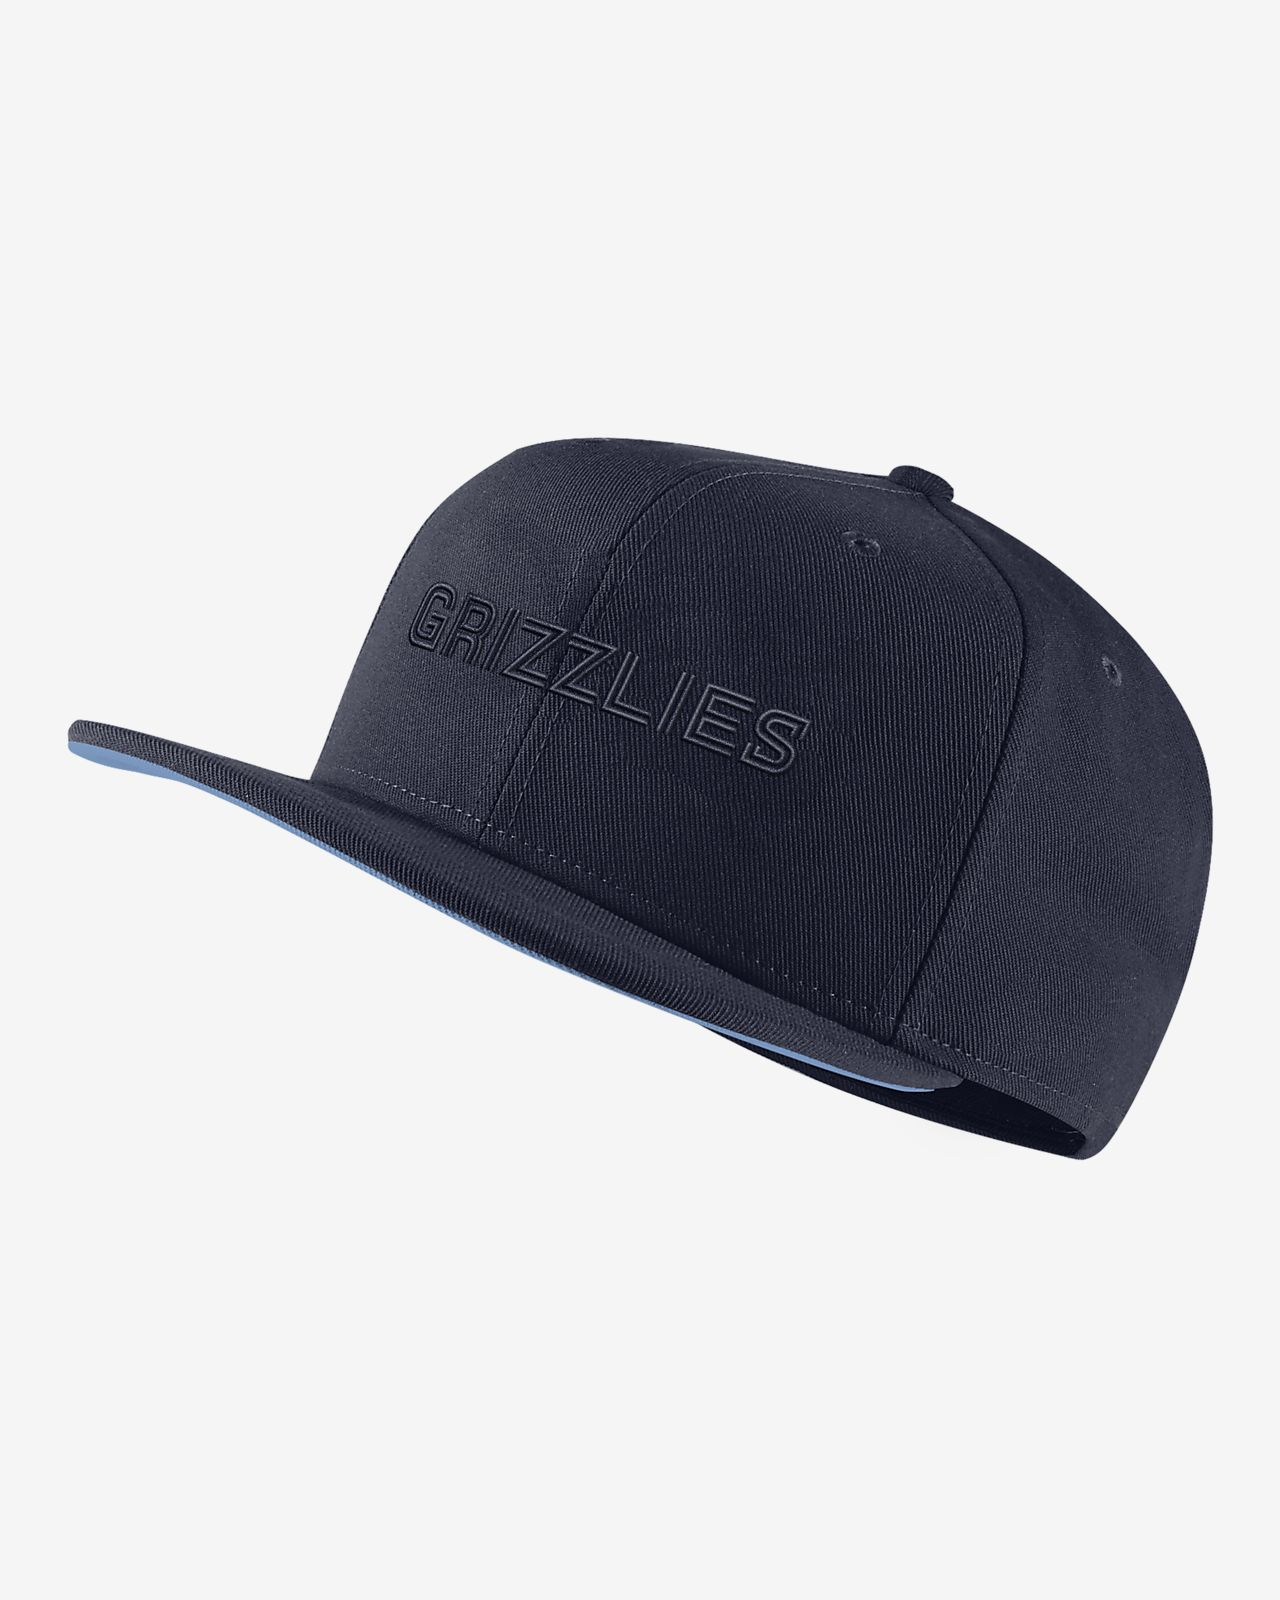 Memphis Grizzlies Nike AeroBill NBA Hat